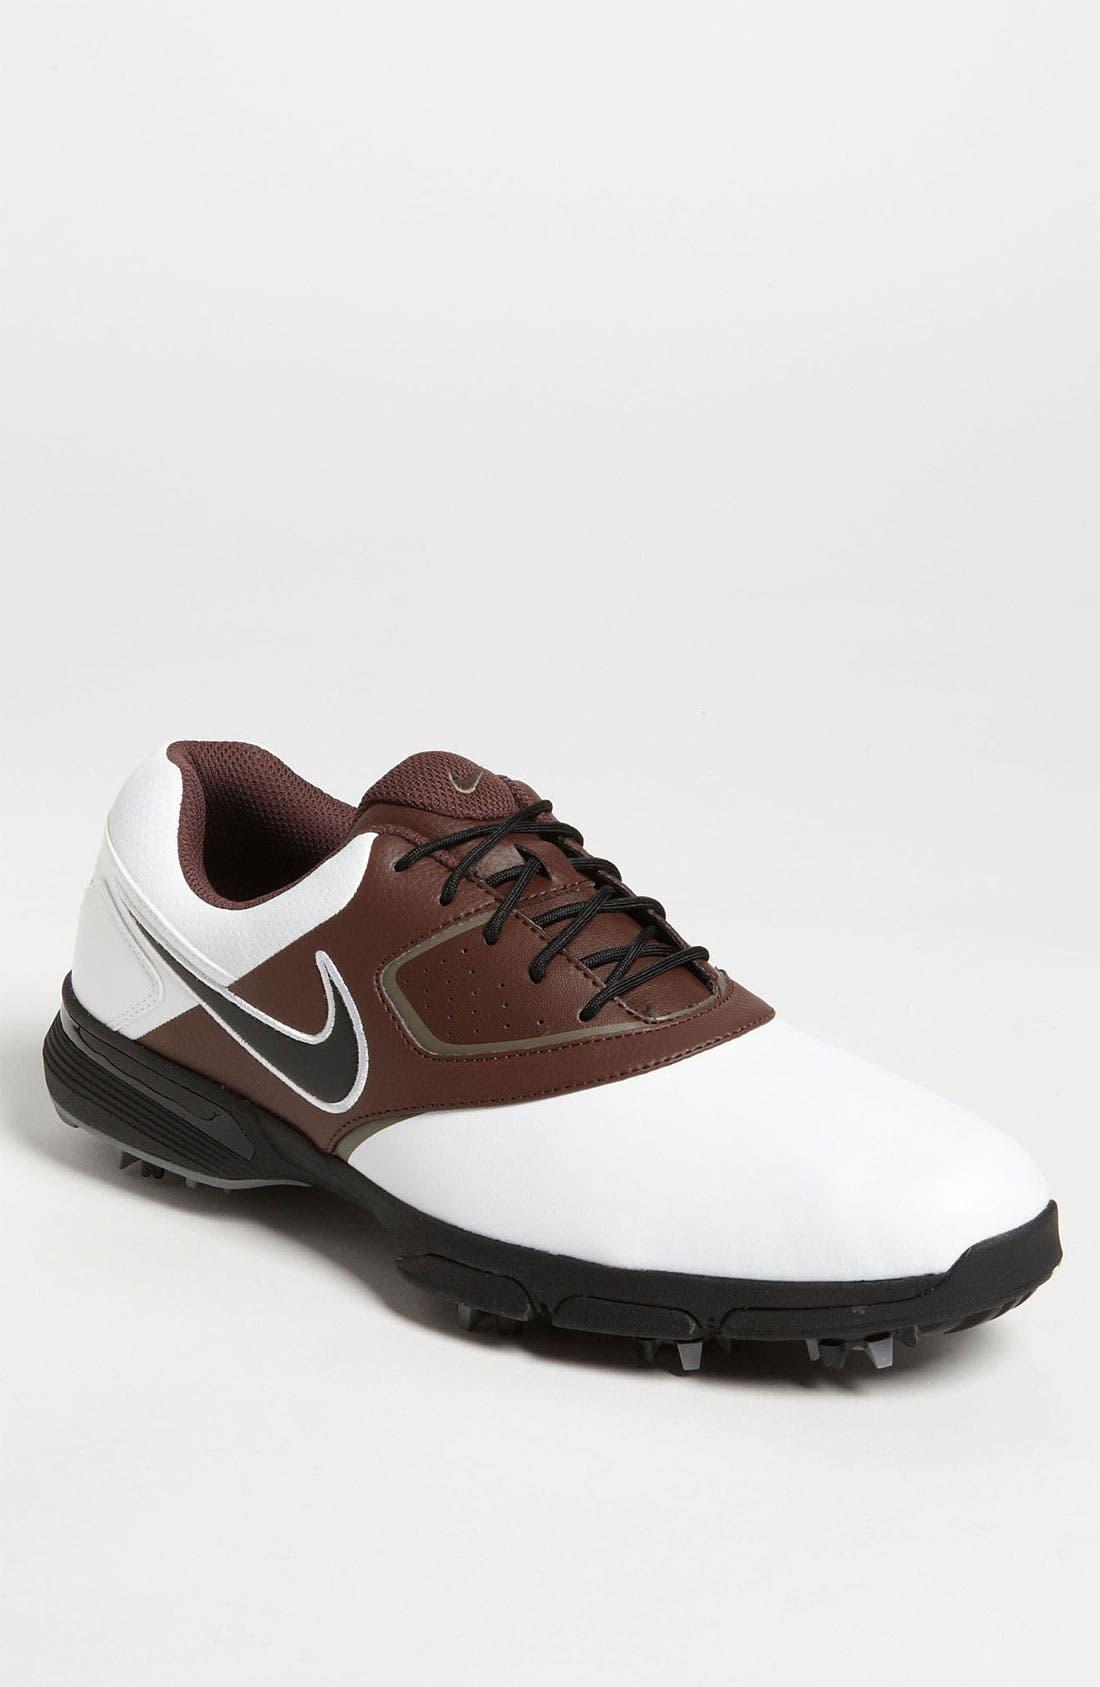 Alternate Image 1 Selected - Nike 'Heritage' Golf Shoe (Men)